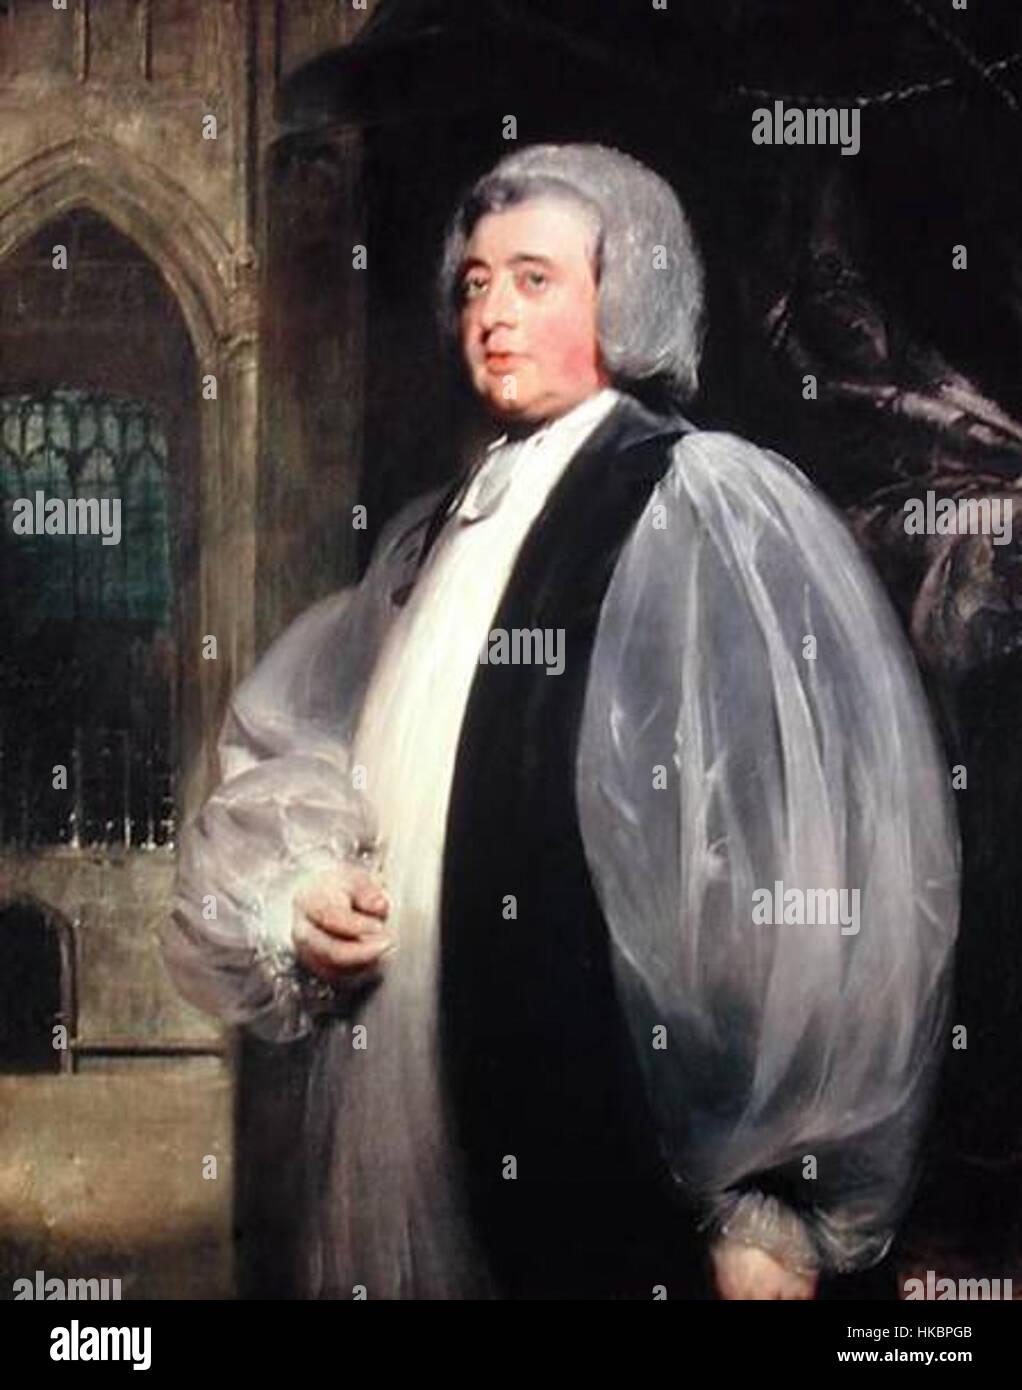 ArchbishopMoore - Stock Image